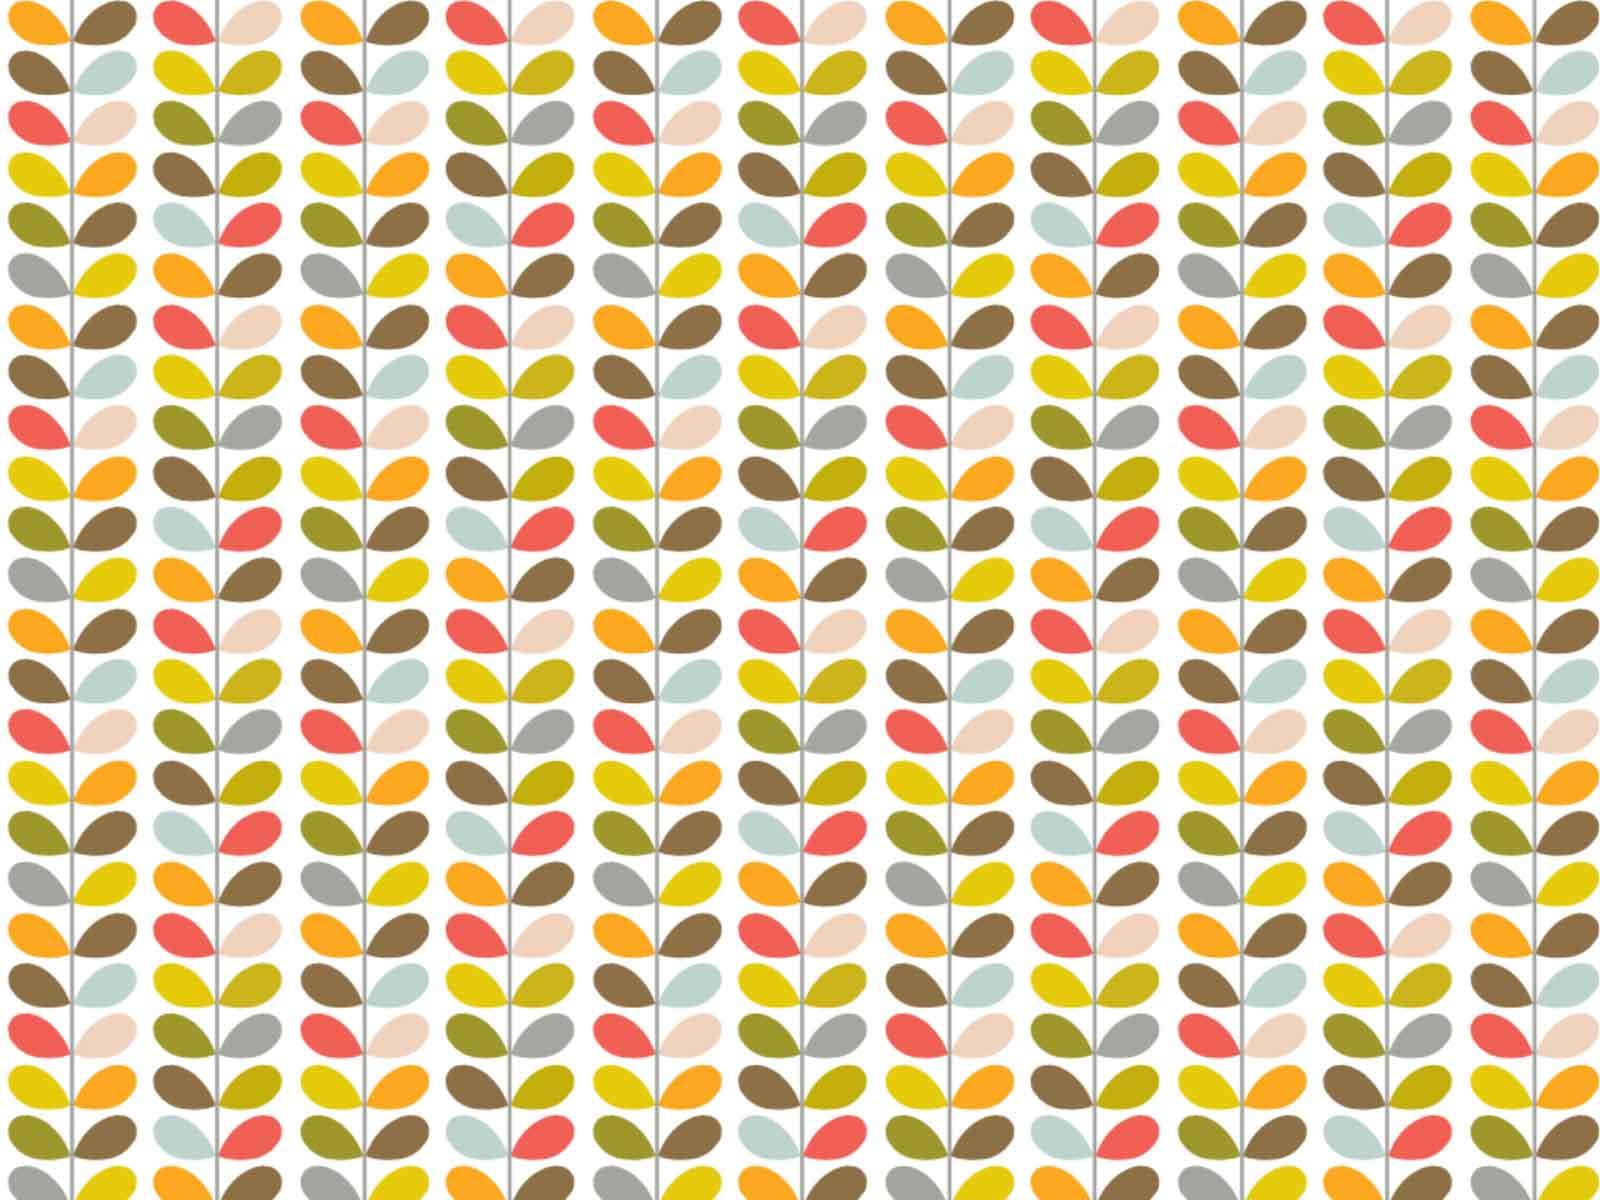 Fall Lilly Pulitzer Wallpaper Forty Weeks Freebie Orla Kiely Inspired Multi Stem Pattern